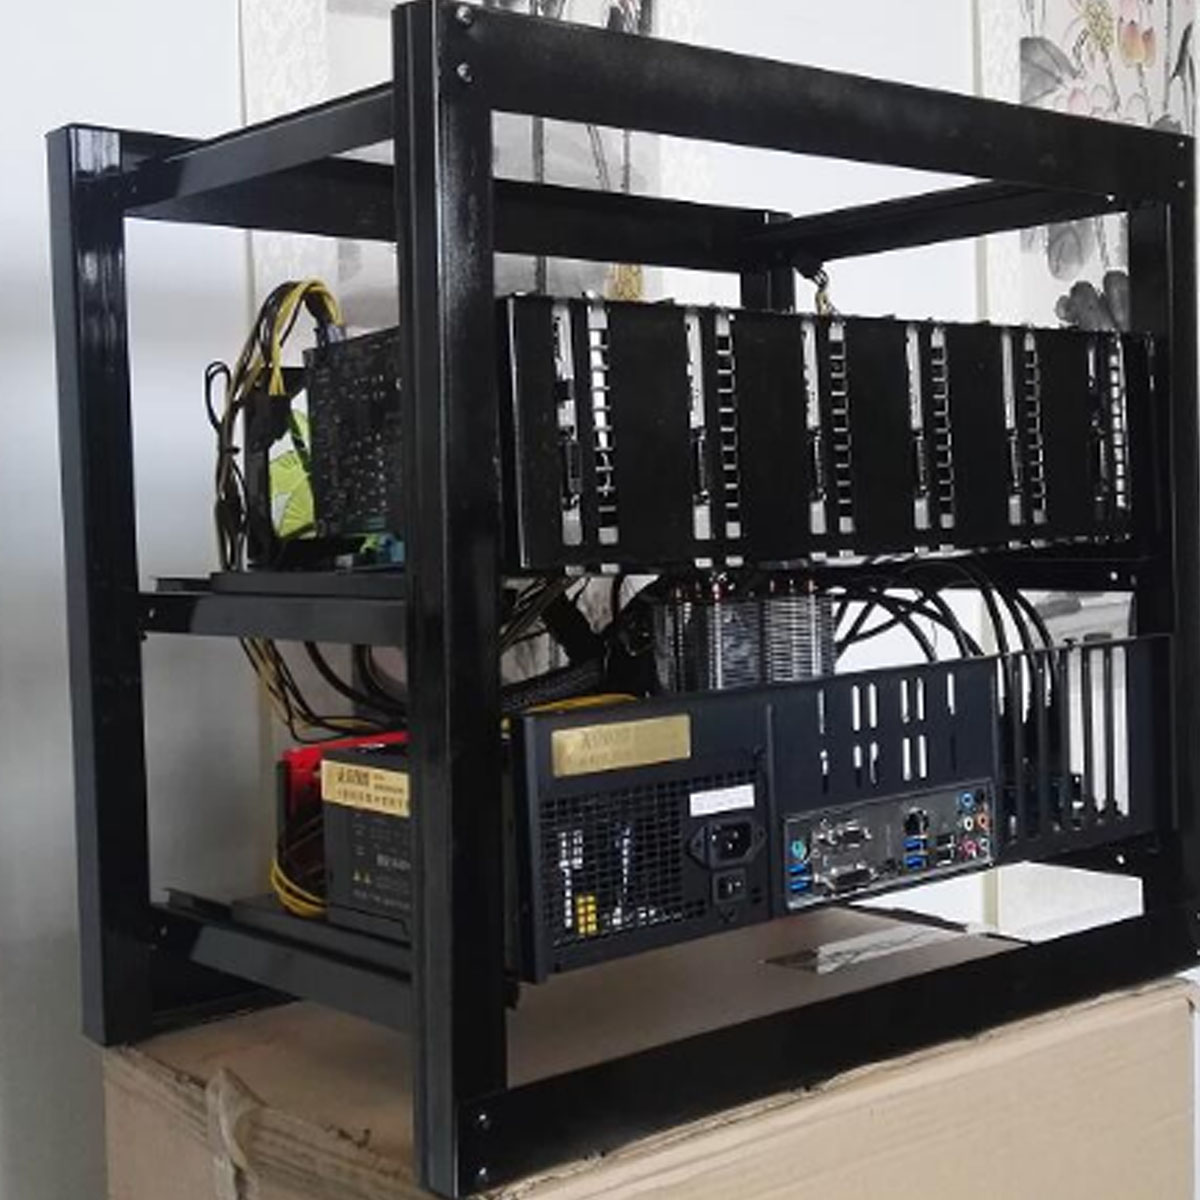 6 GPU 4 Fans Steel Coin Open Air Mining Frame Rig Case BTC ETH Ethereum Miner BR